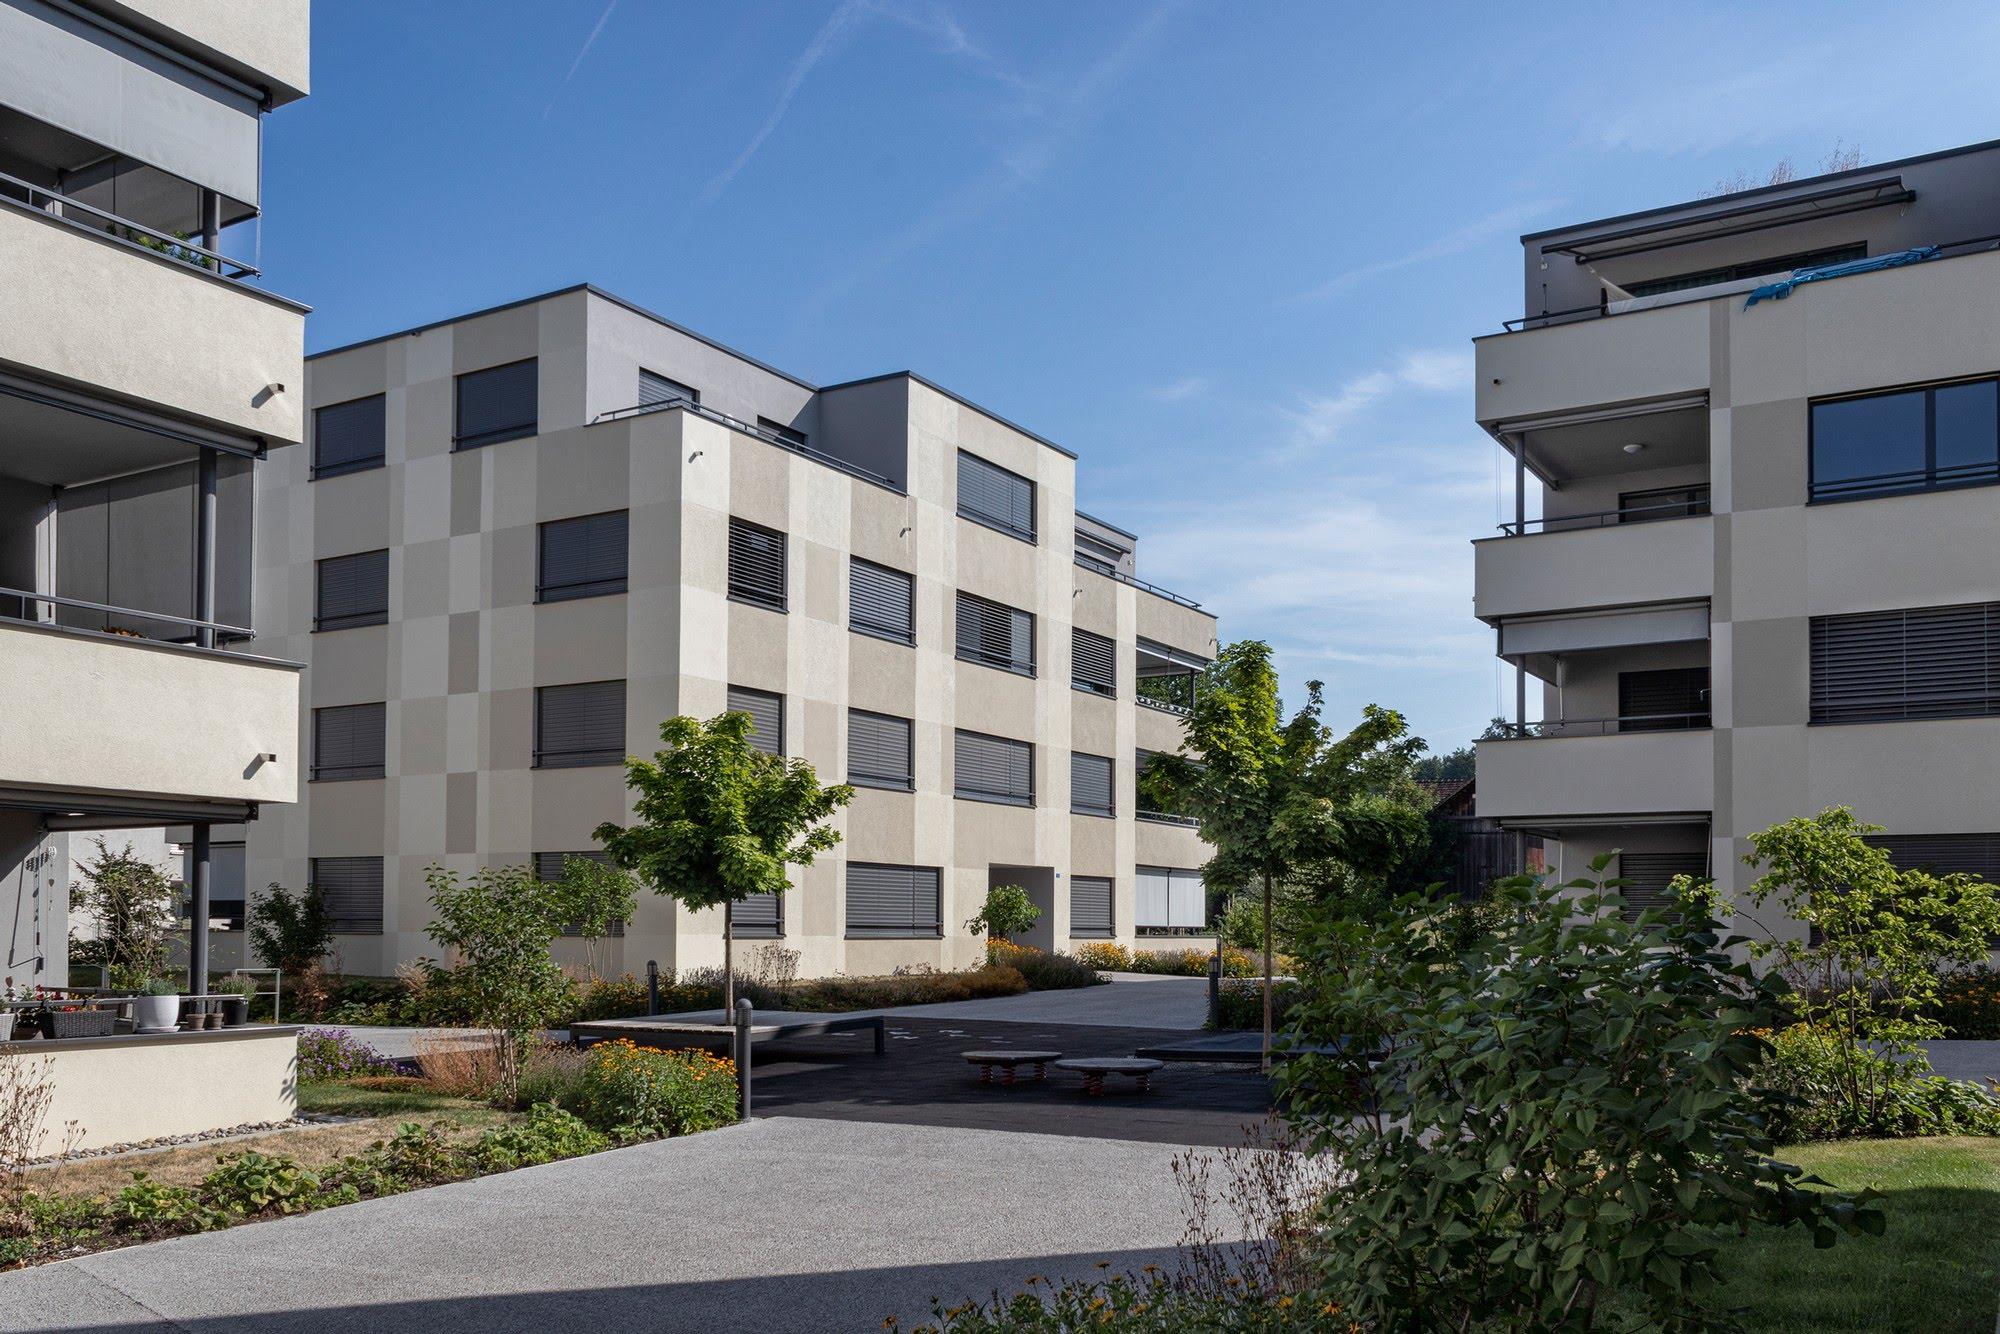 Wohnungsbau Überbauung Stehli Areal